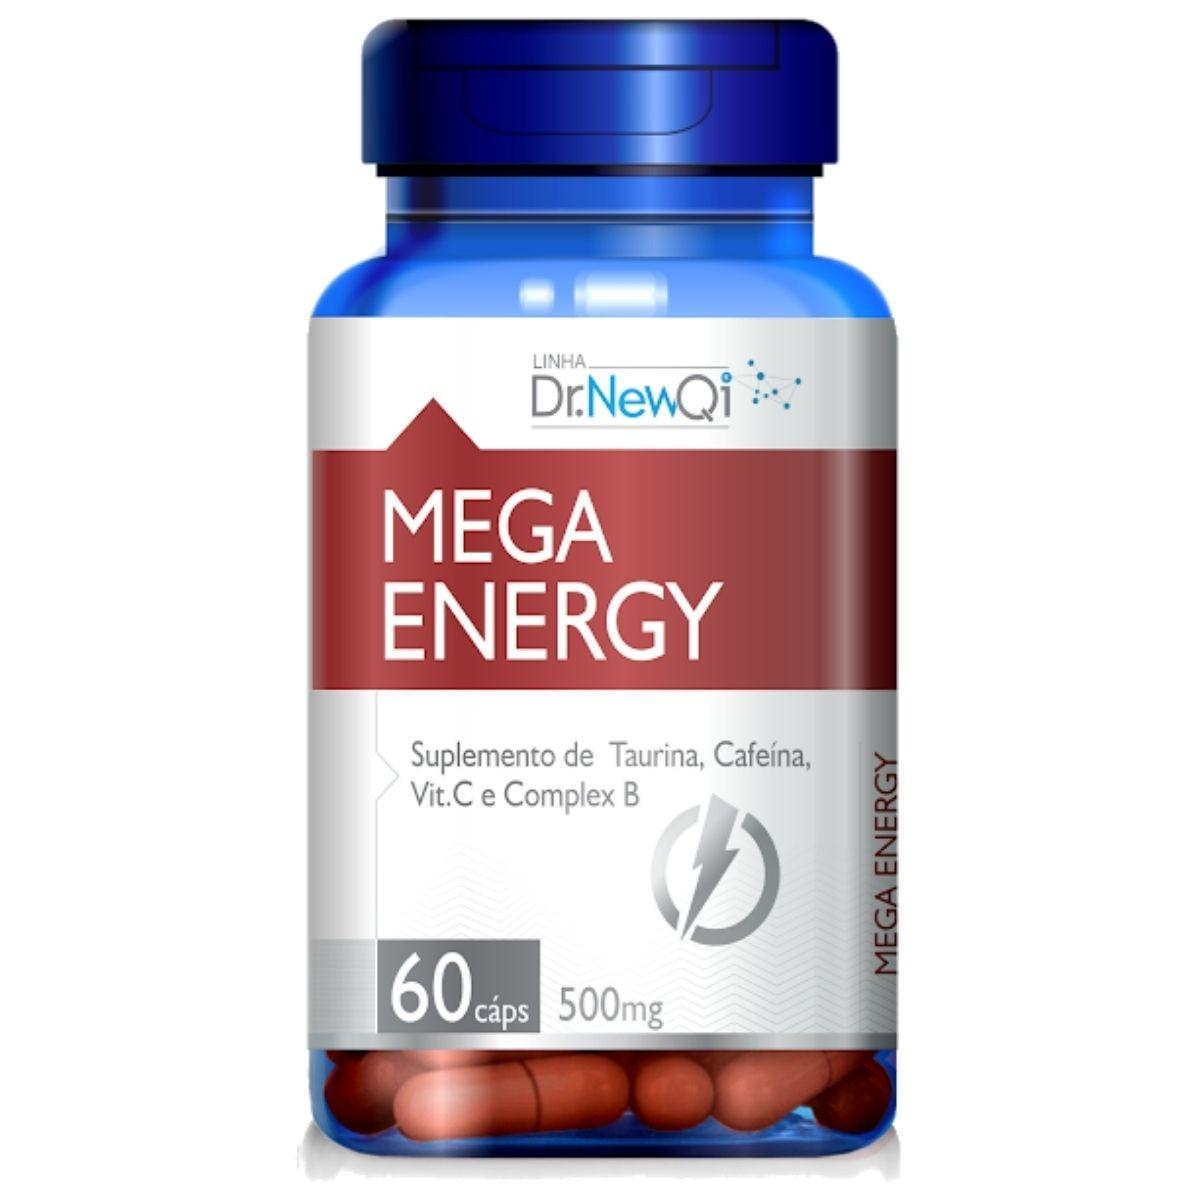 Mega Energy Taurina + Cafeína + Vit. C e Complexo B 60 Cápsulas - Upnutri